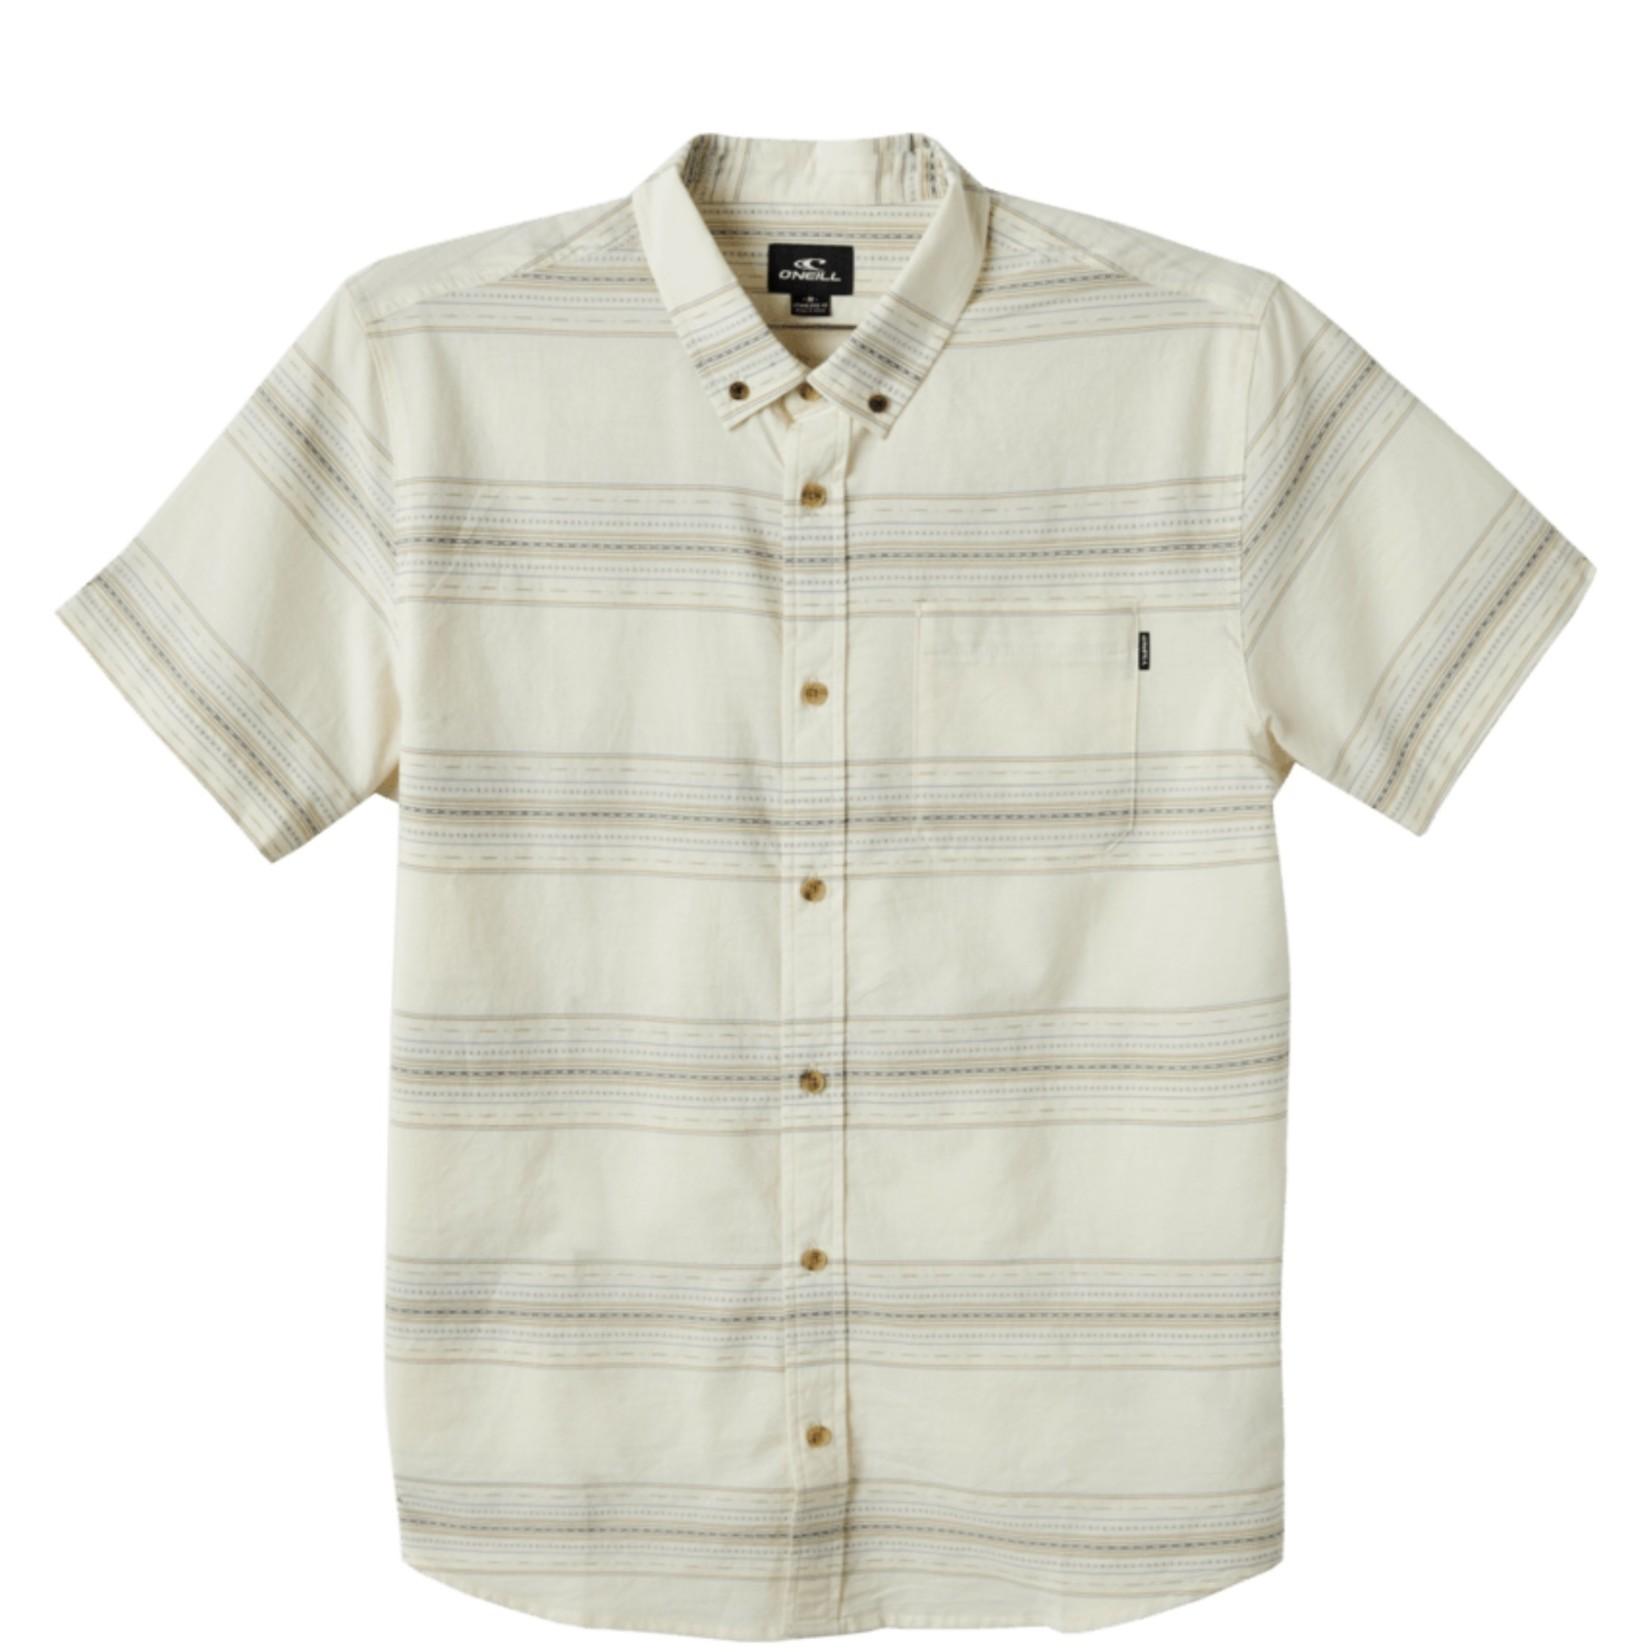 O'Neill O'Neill Crestmont S/S Shirt